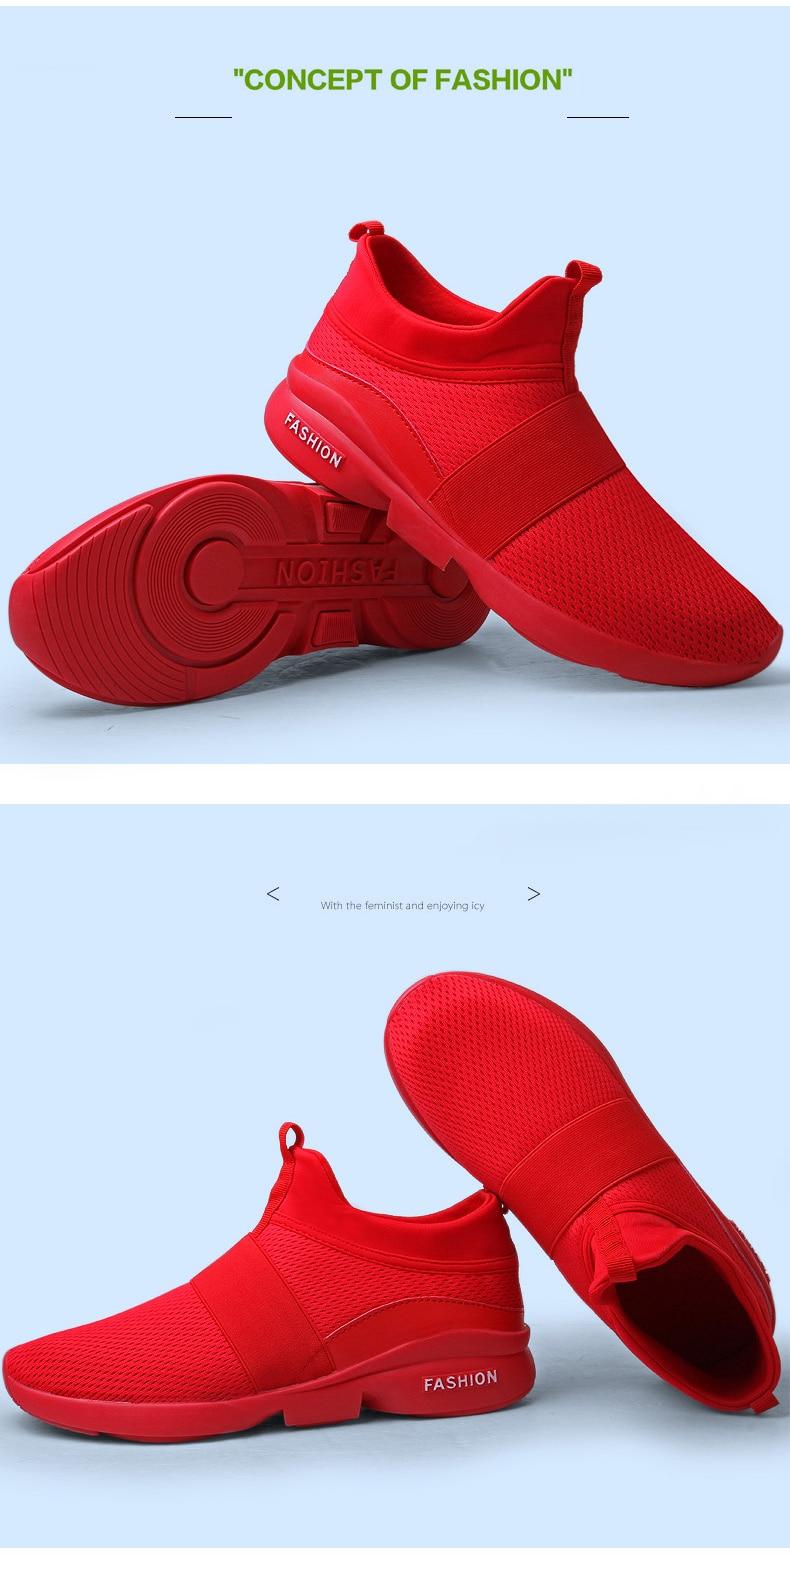 HTB1oAX9egmH3KVjSZKzq6z2OXXa0 Damyuan New Fashion Men Women Flyweather Comfortable Breathable Non-leather Casual Light Size 46 Sport Mesh Jogging Shoes